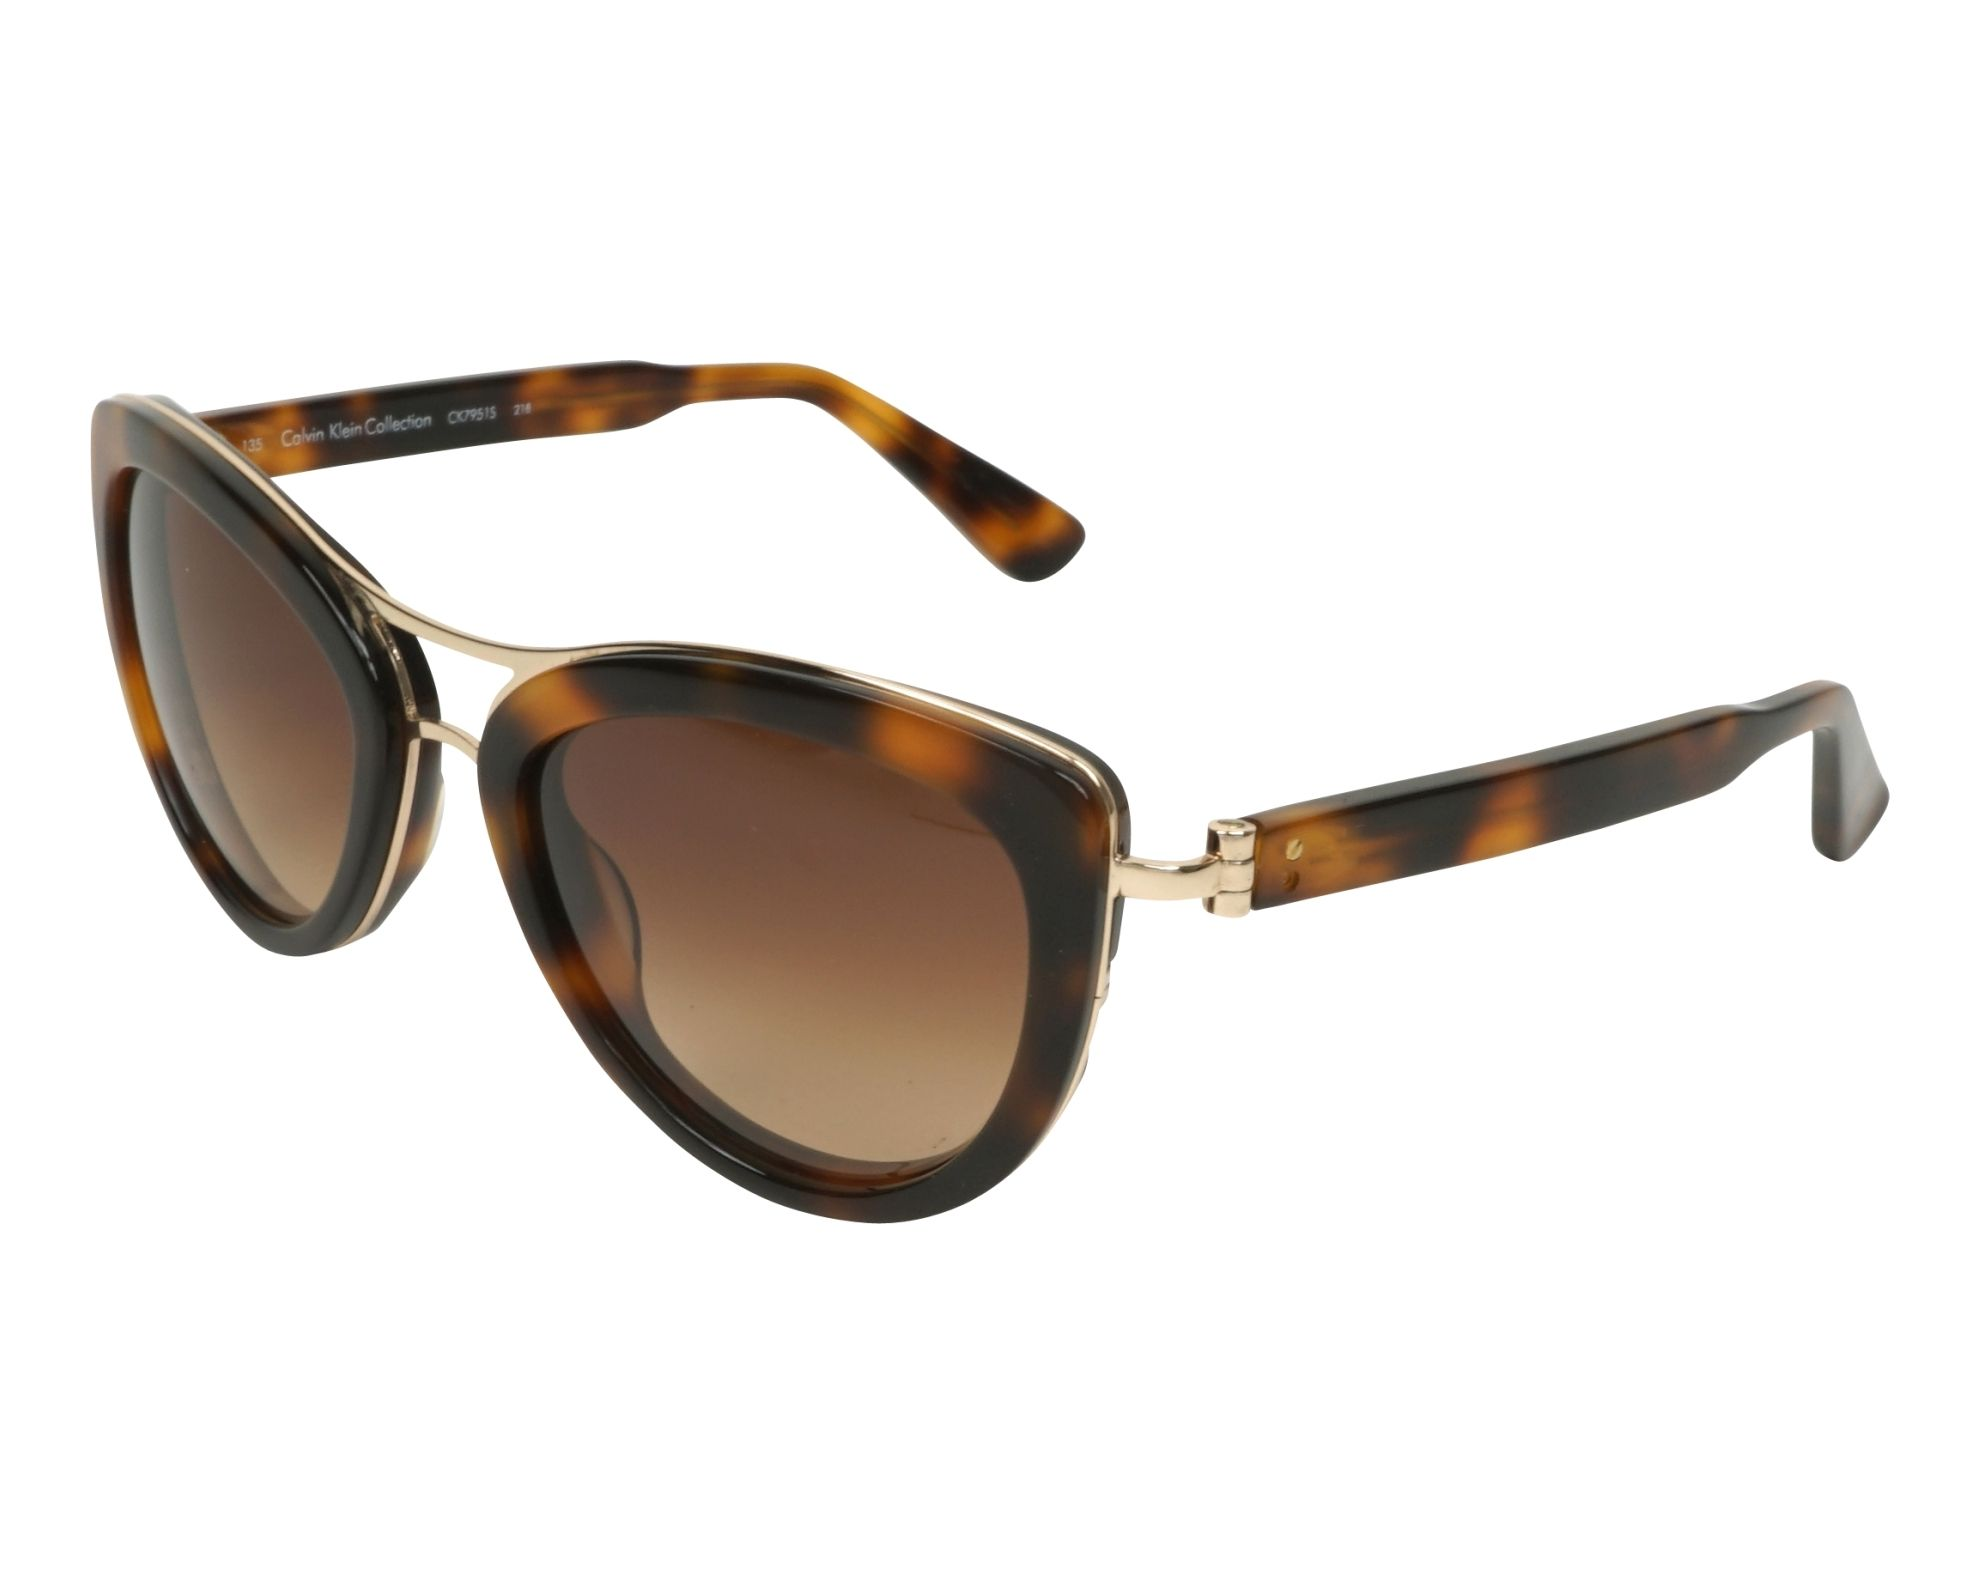 af3d1b4719 Gafas de sol Calvin Klein CK-7951-S 218 55-20 Havana Oro